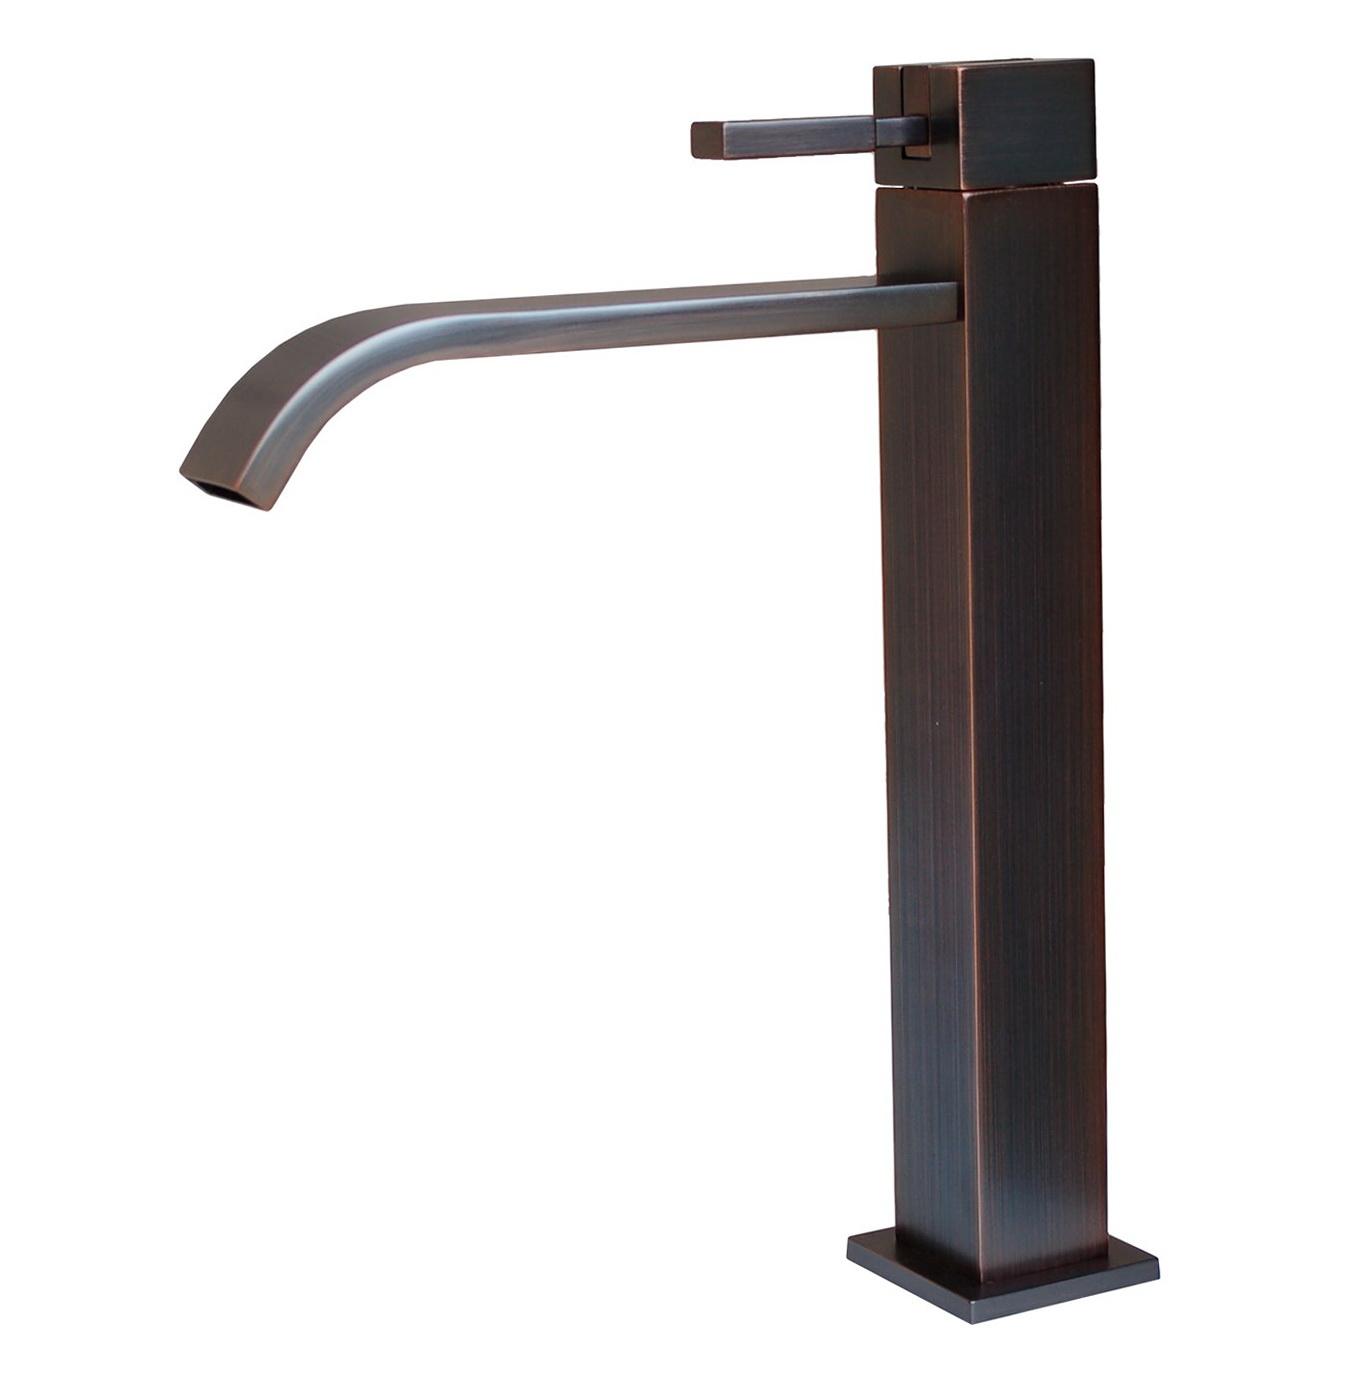 Lowes Bathroom Faucets Single Hole